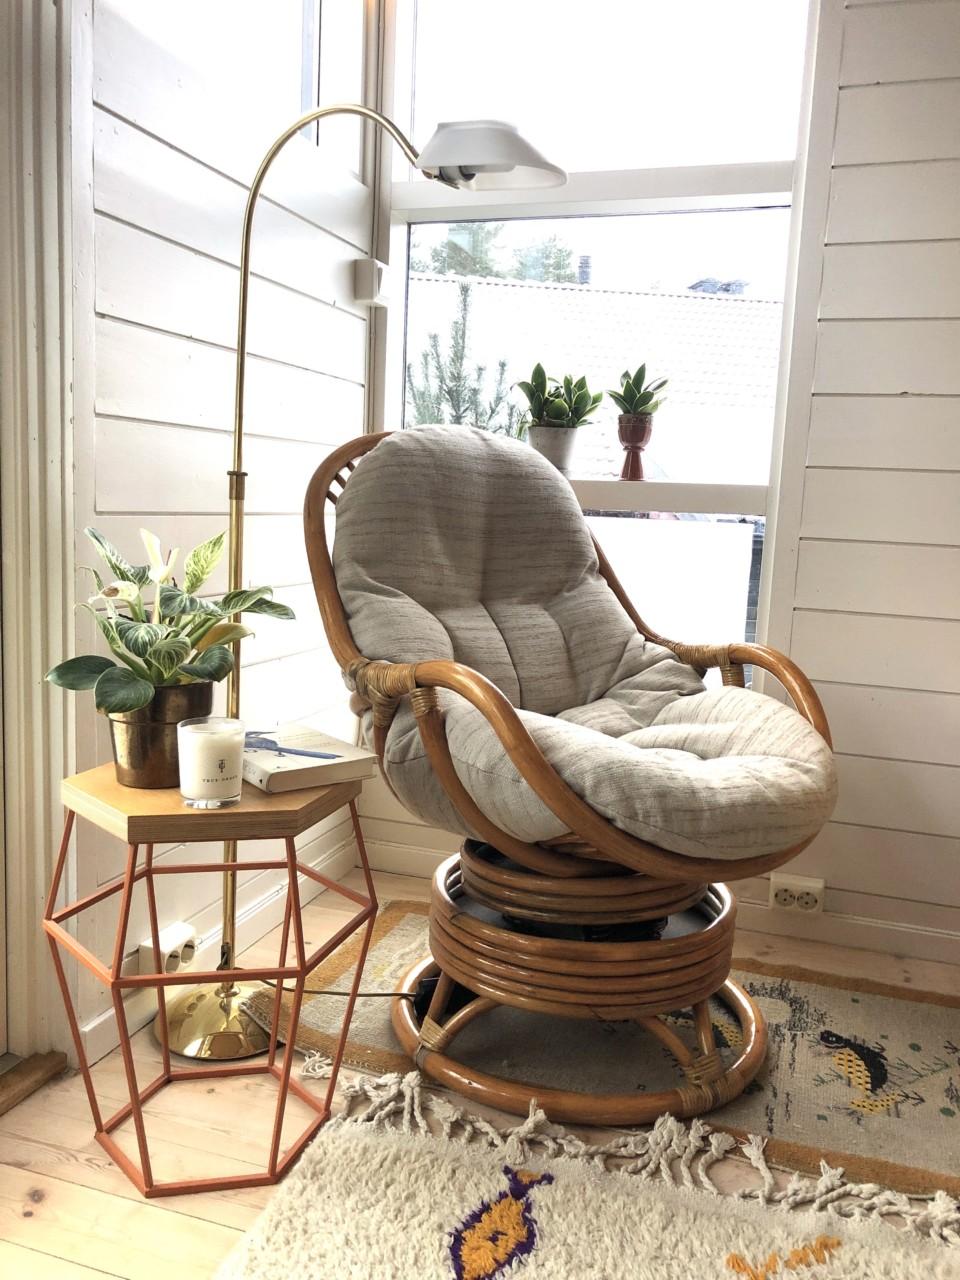 Bærekraftig interiør og historien bak en stol